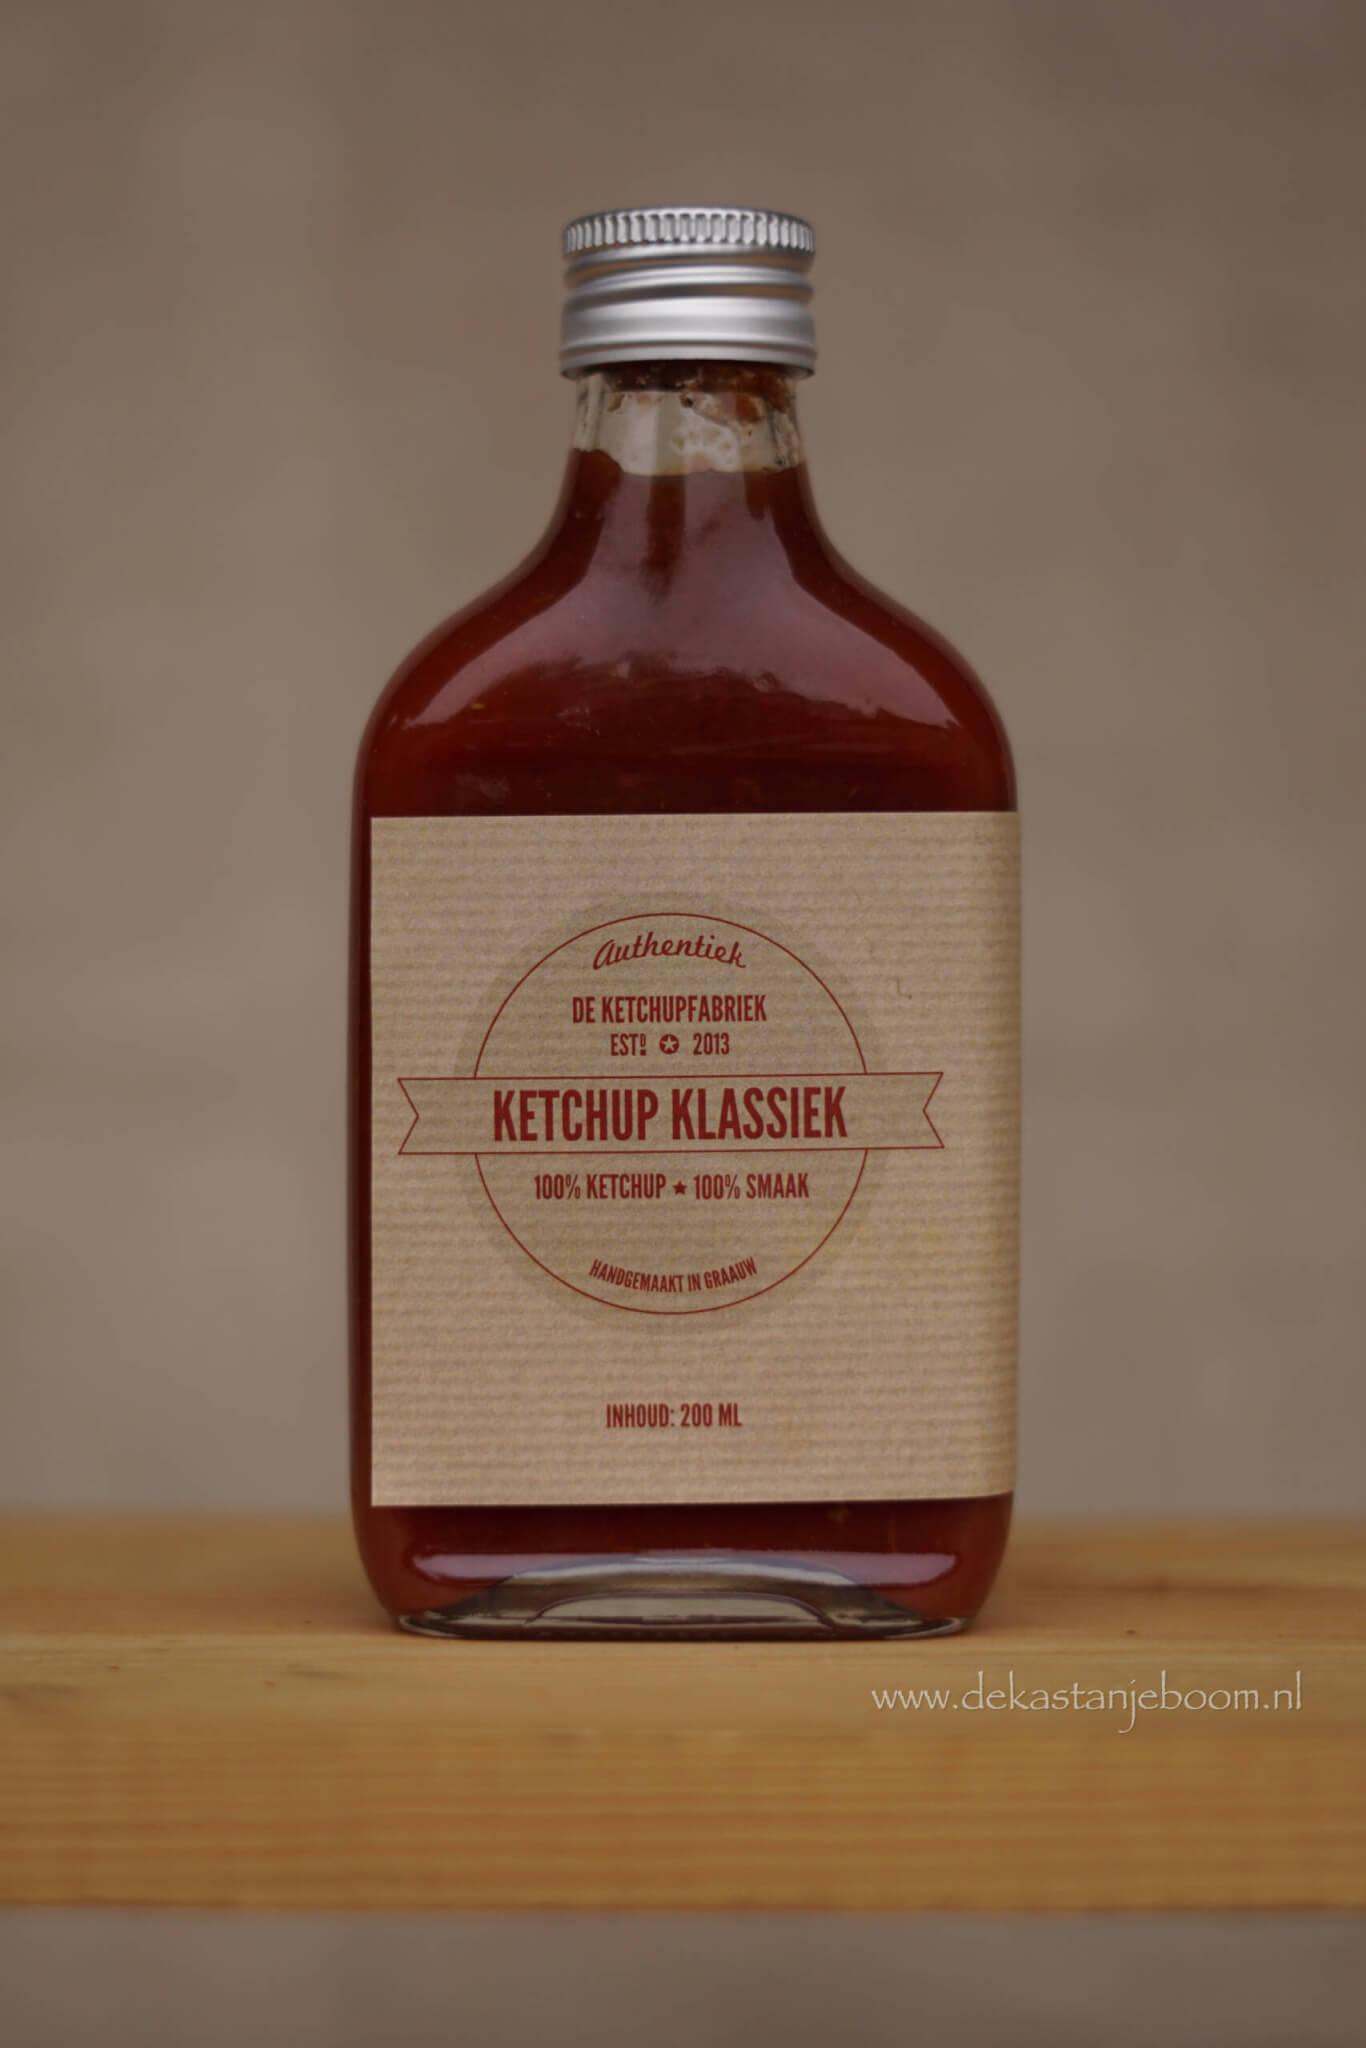 Ketchup klassiek - De Ketchup klassiek